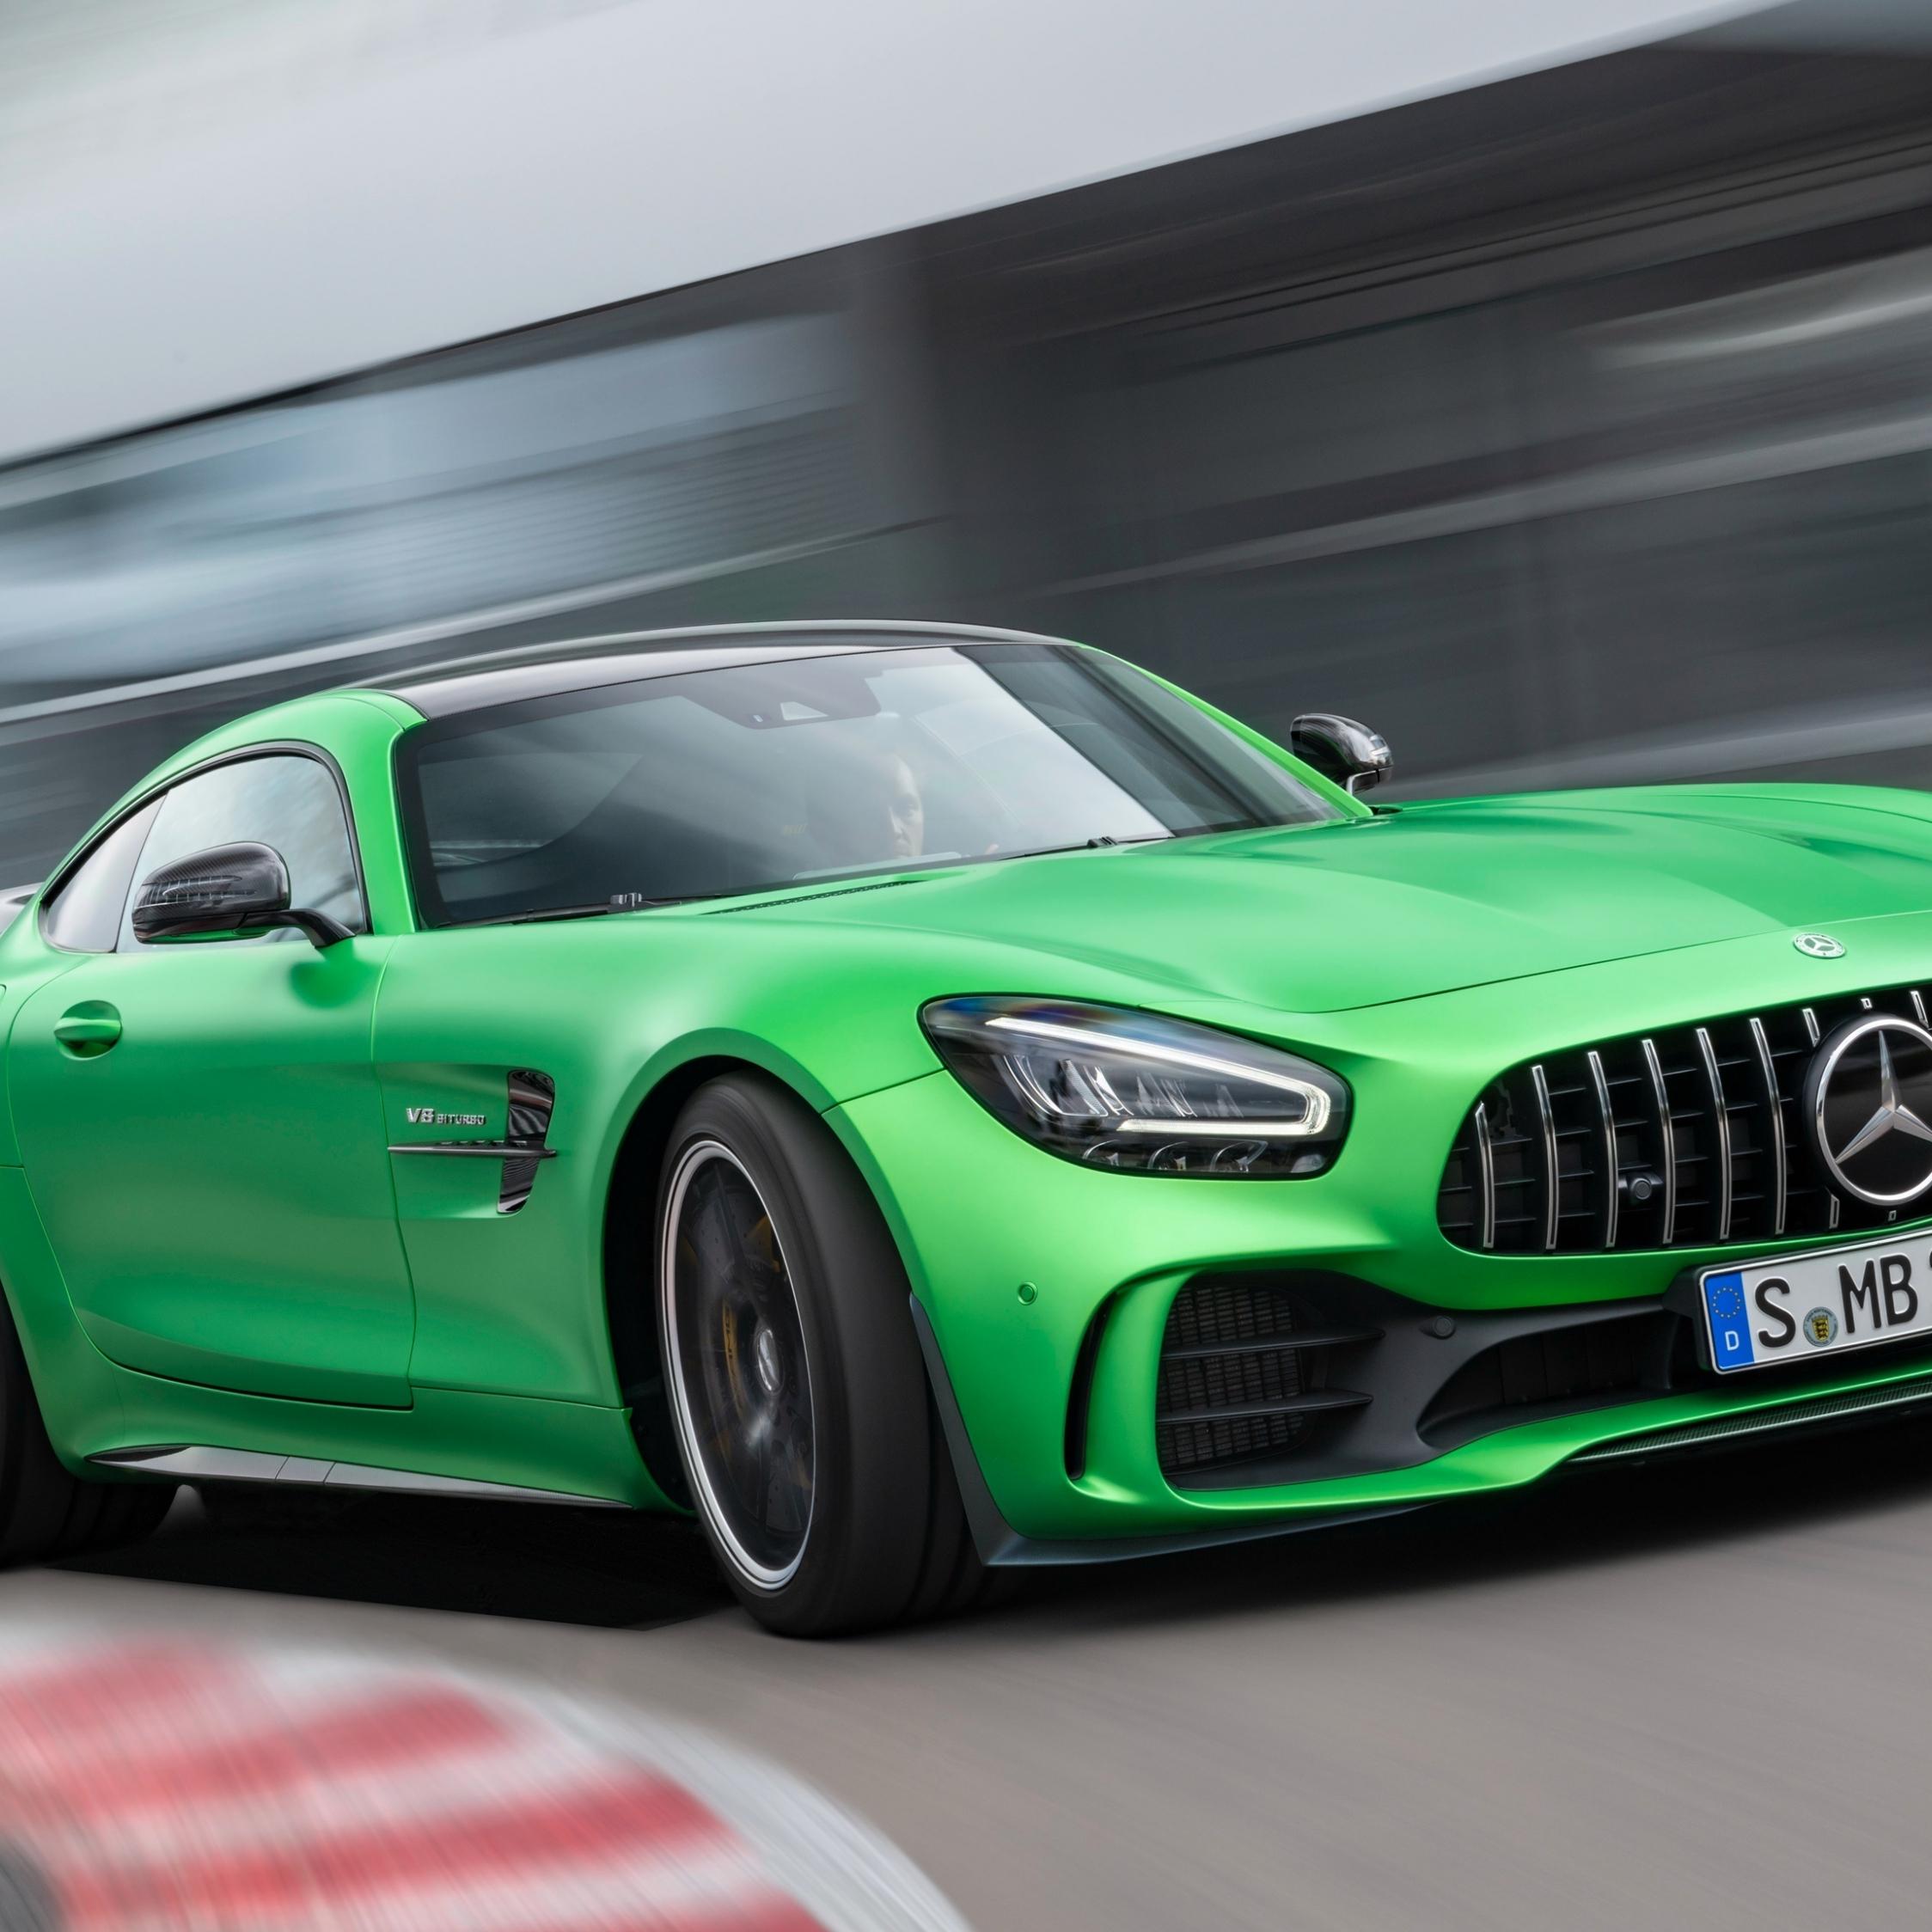 Mercedes-AMG GT, green car, on-road, 2248x2248 wallpaper